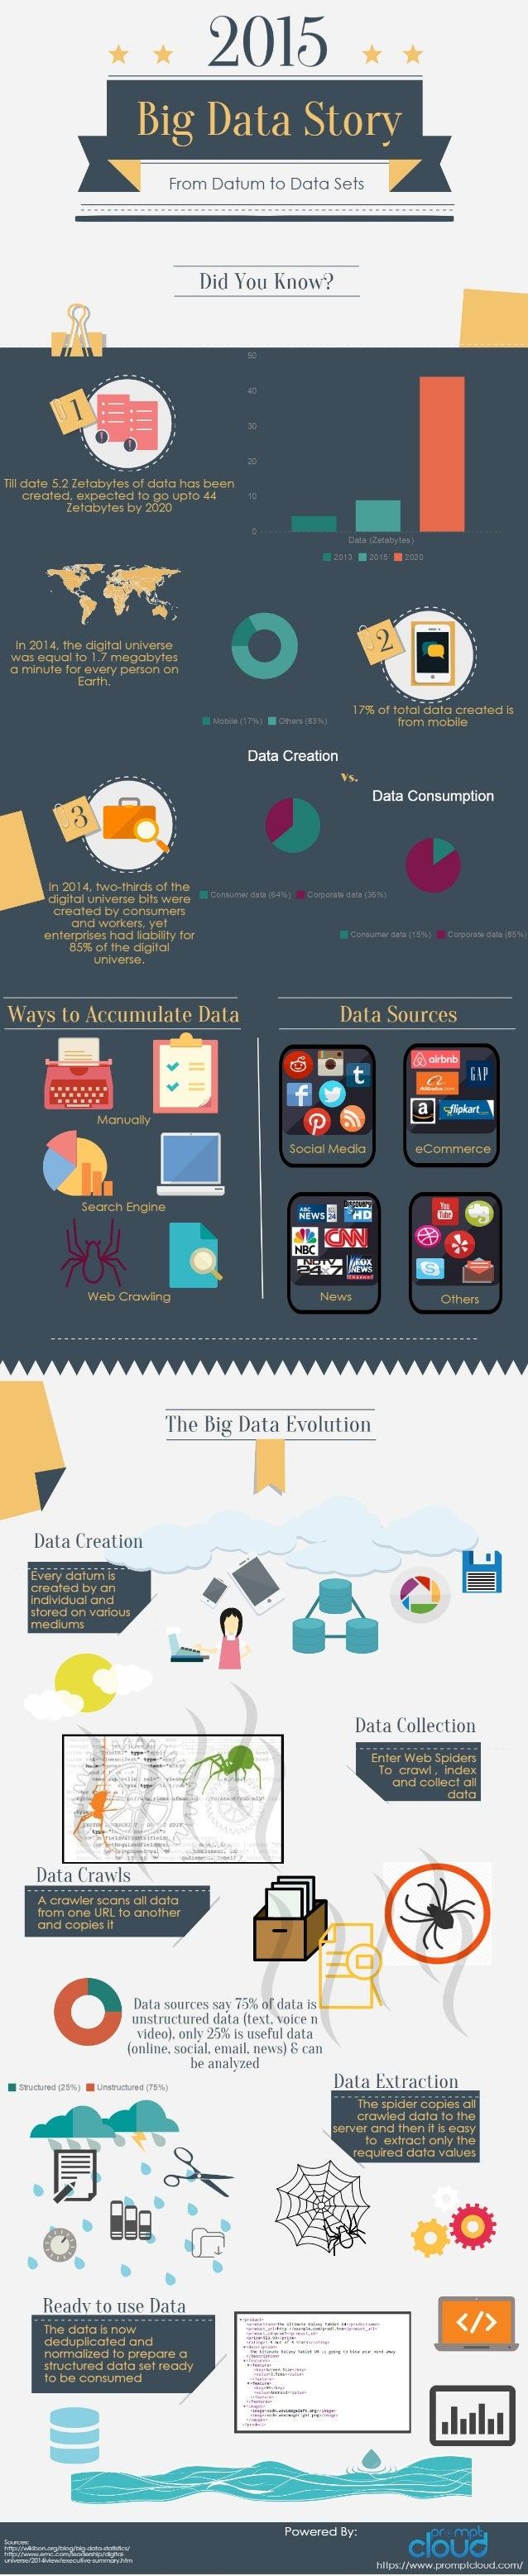 Big data story